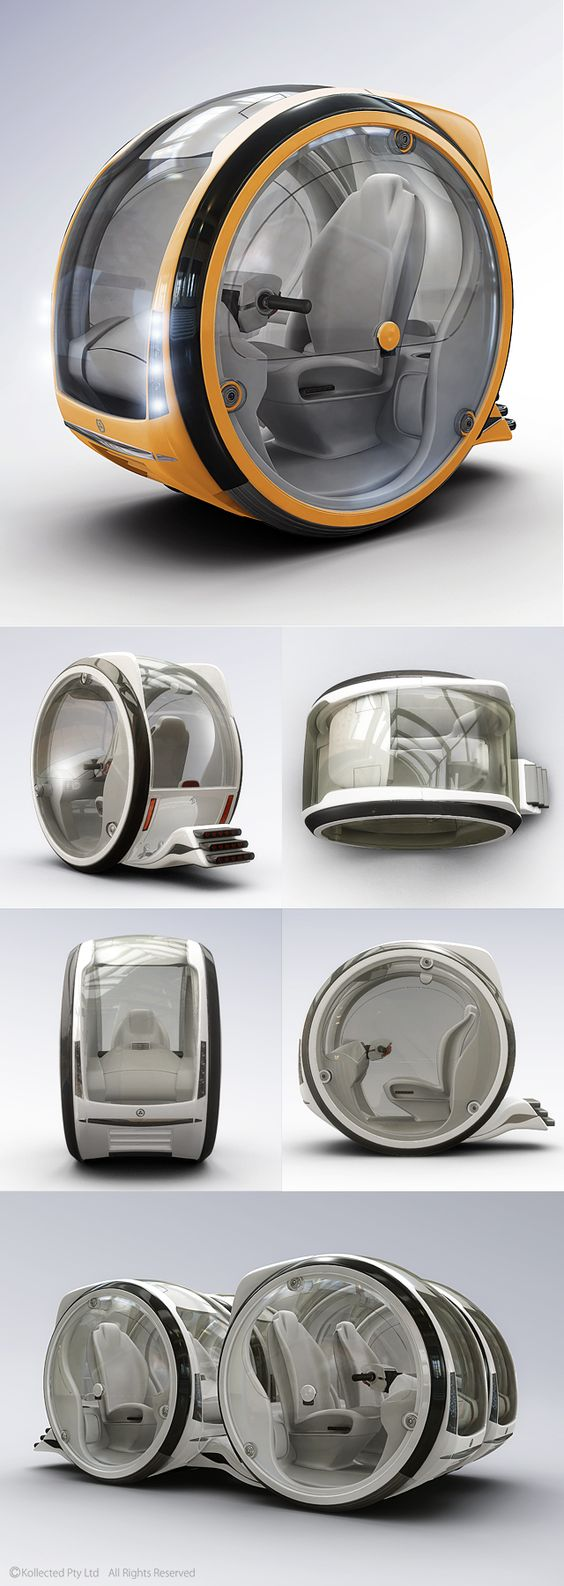 SNAP! by Nick Kaloterakis [Futuristic Vehicles: http://futuristicnews.com/category/future-transportation/]: